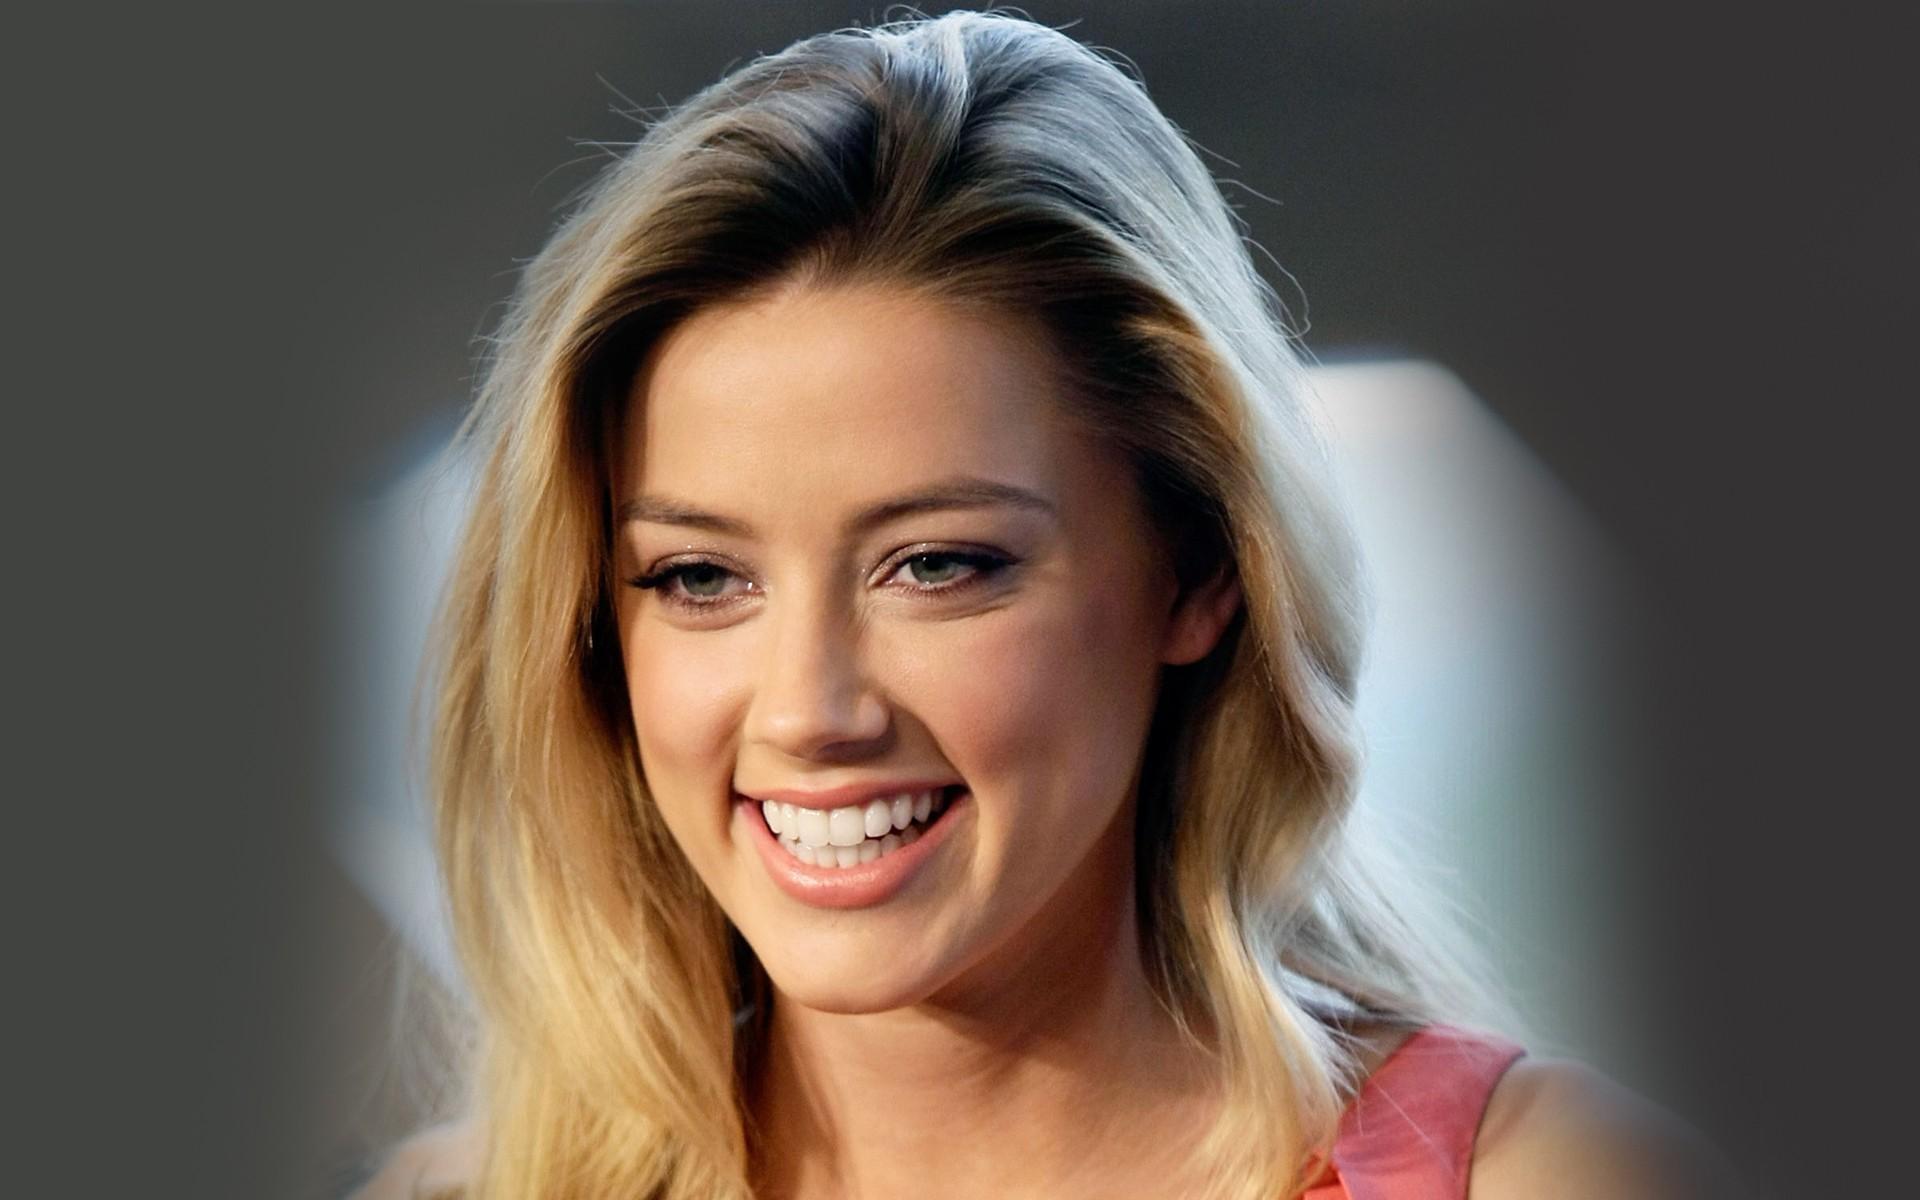 Amber Heard Hd: Amber Heard HD